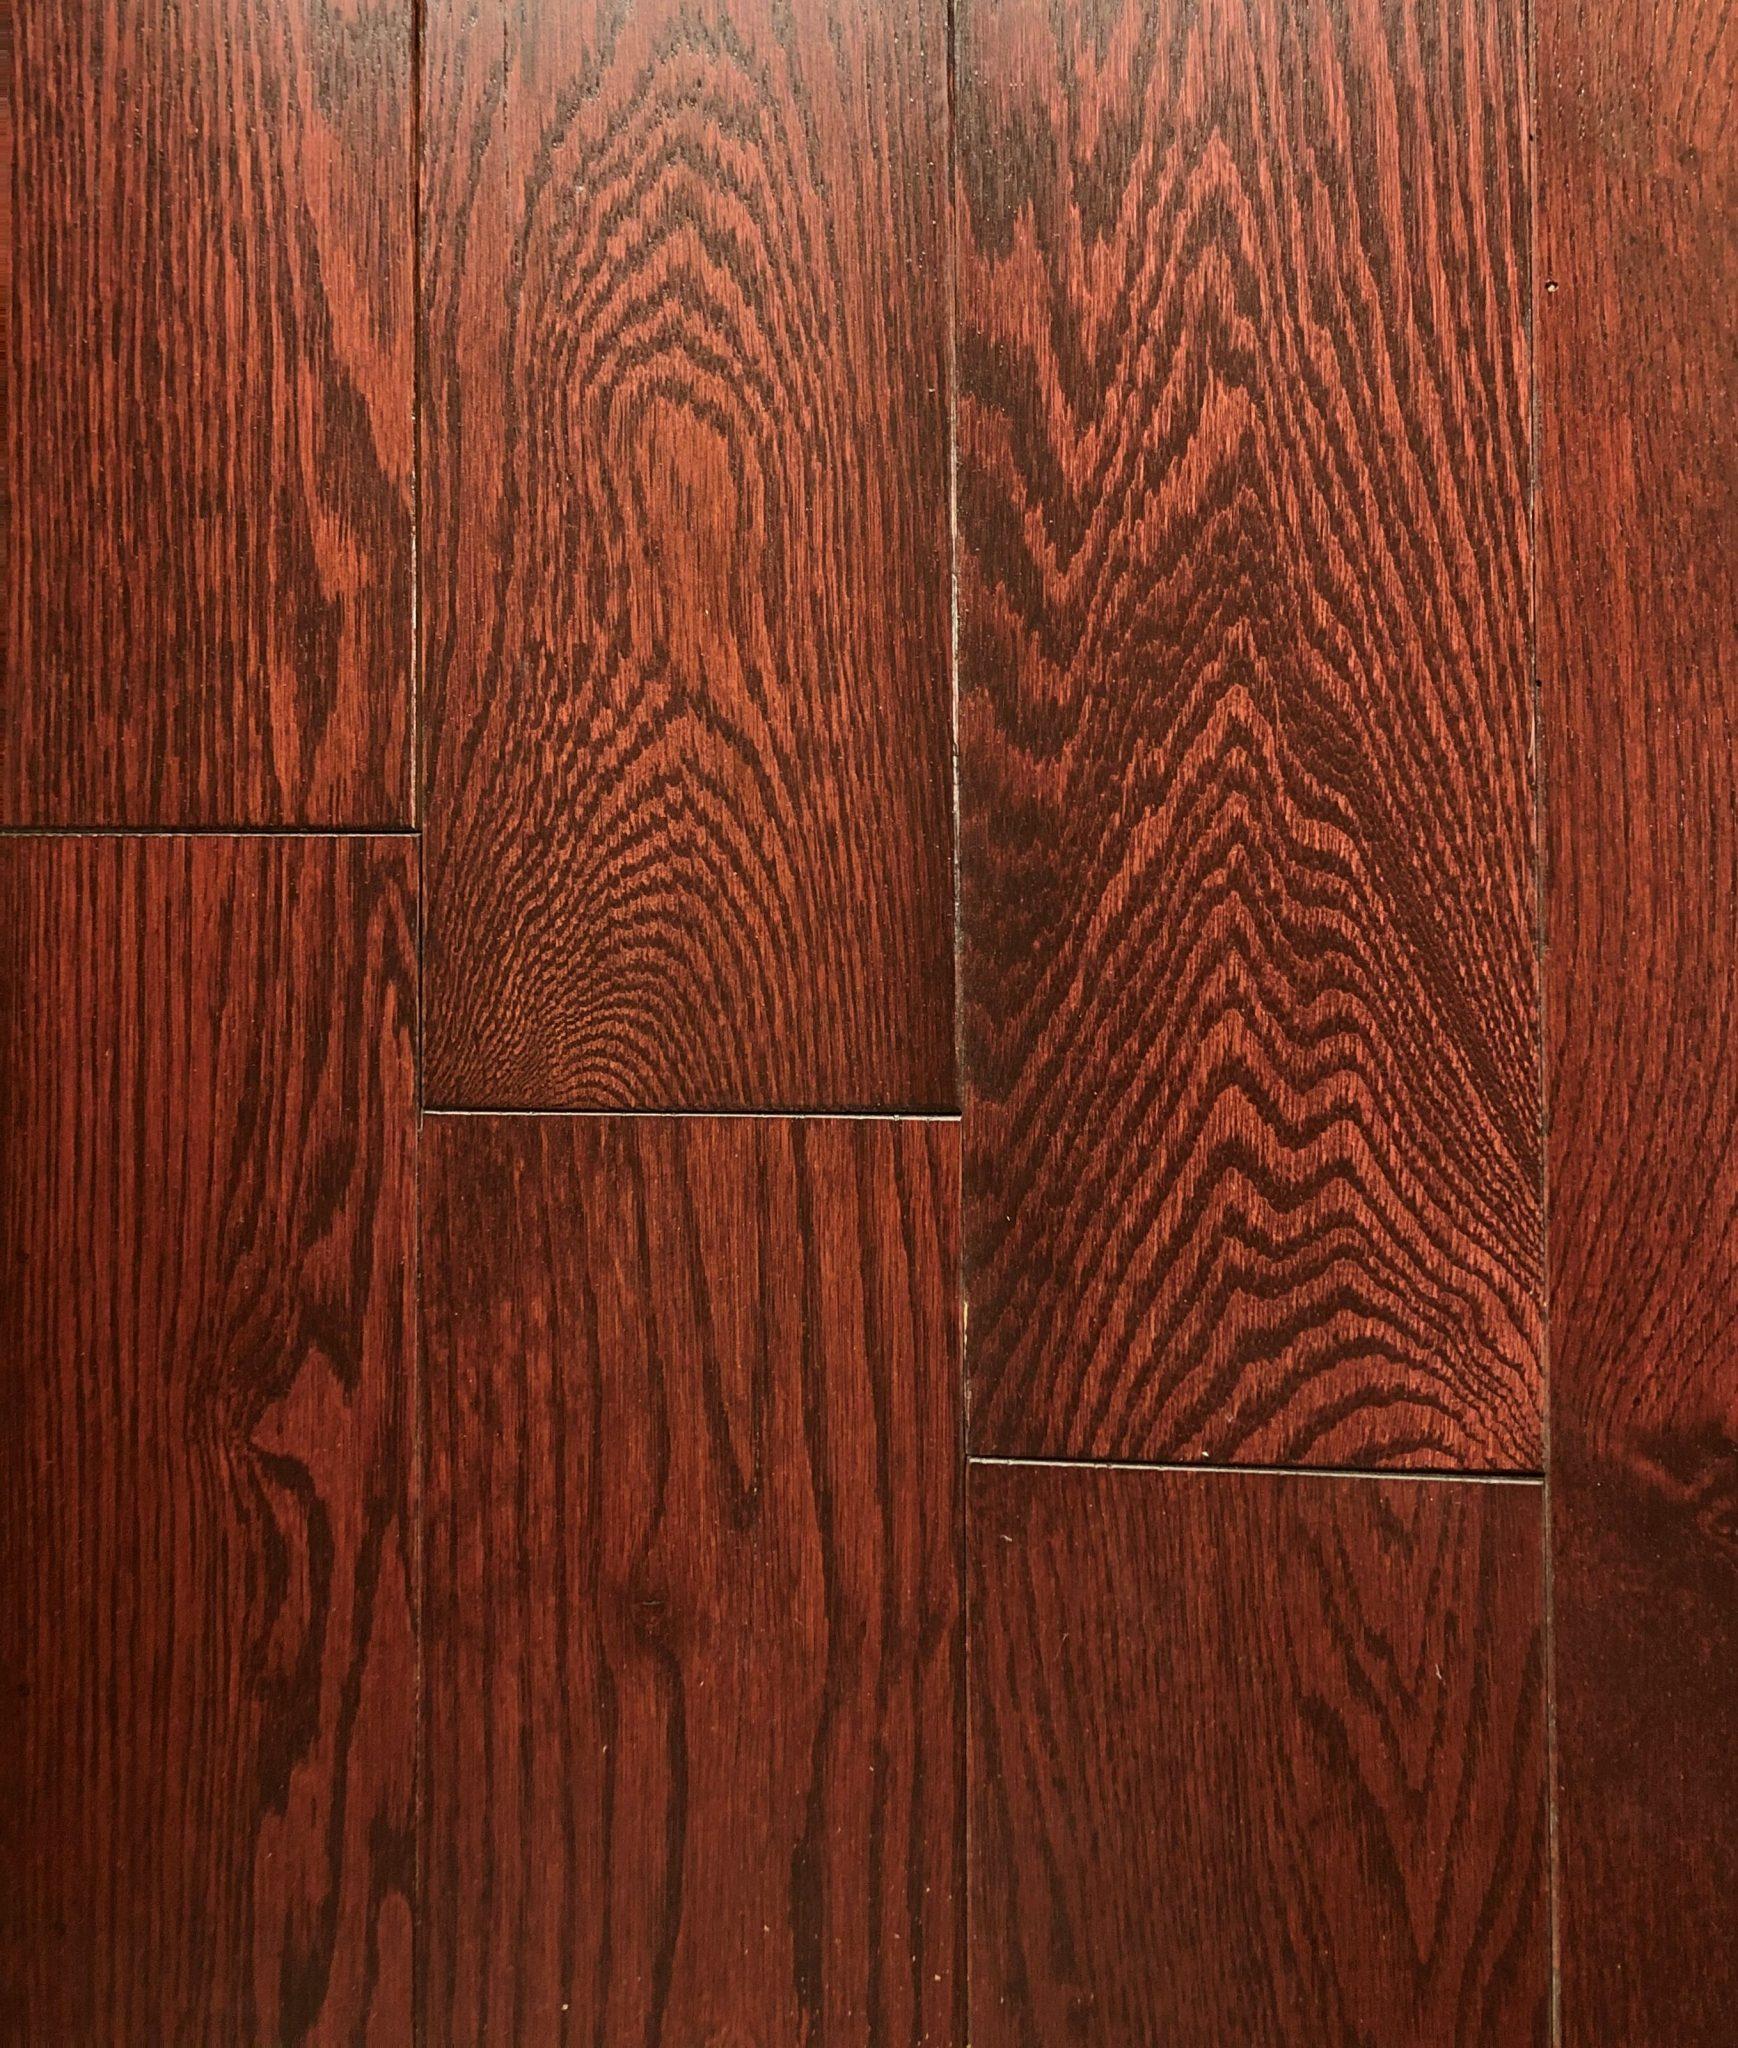 Pal Cherry Rustic Red Oak Hardwood Planet Flooring